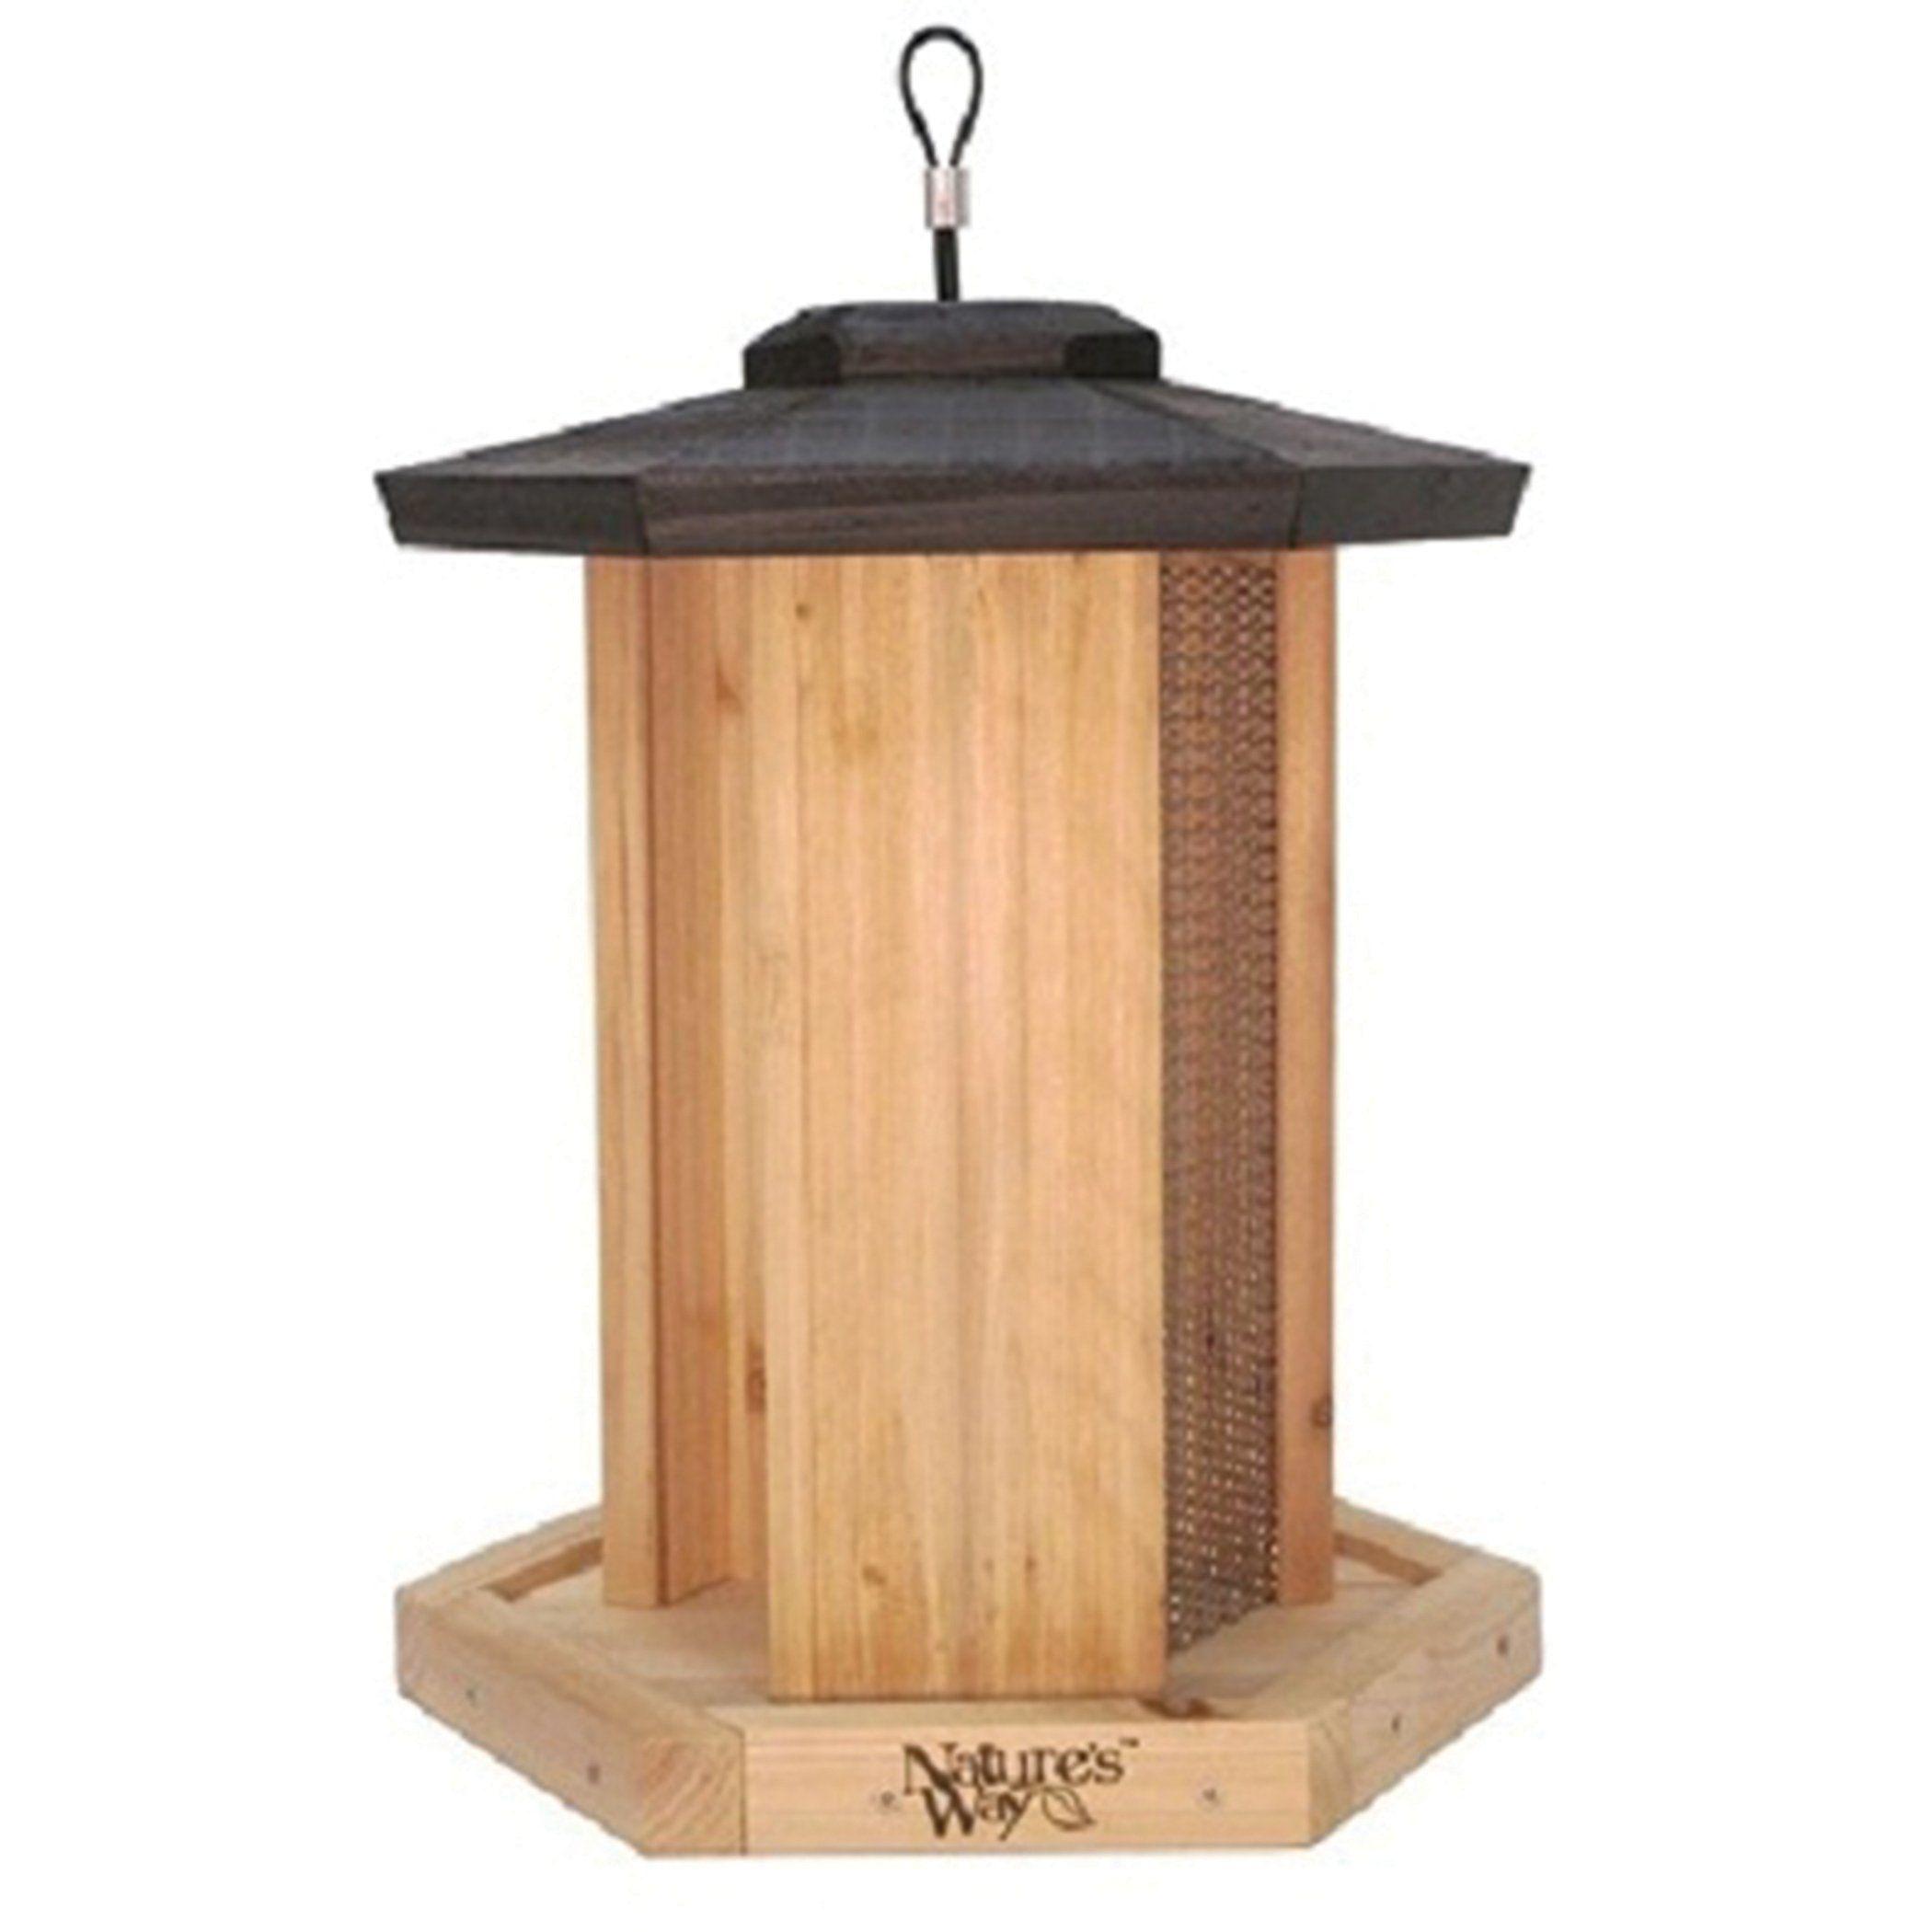 Natures Way Bird PrdtsTriple Chamber Gazebo Feeder Cedar